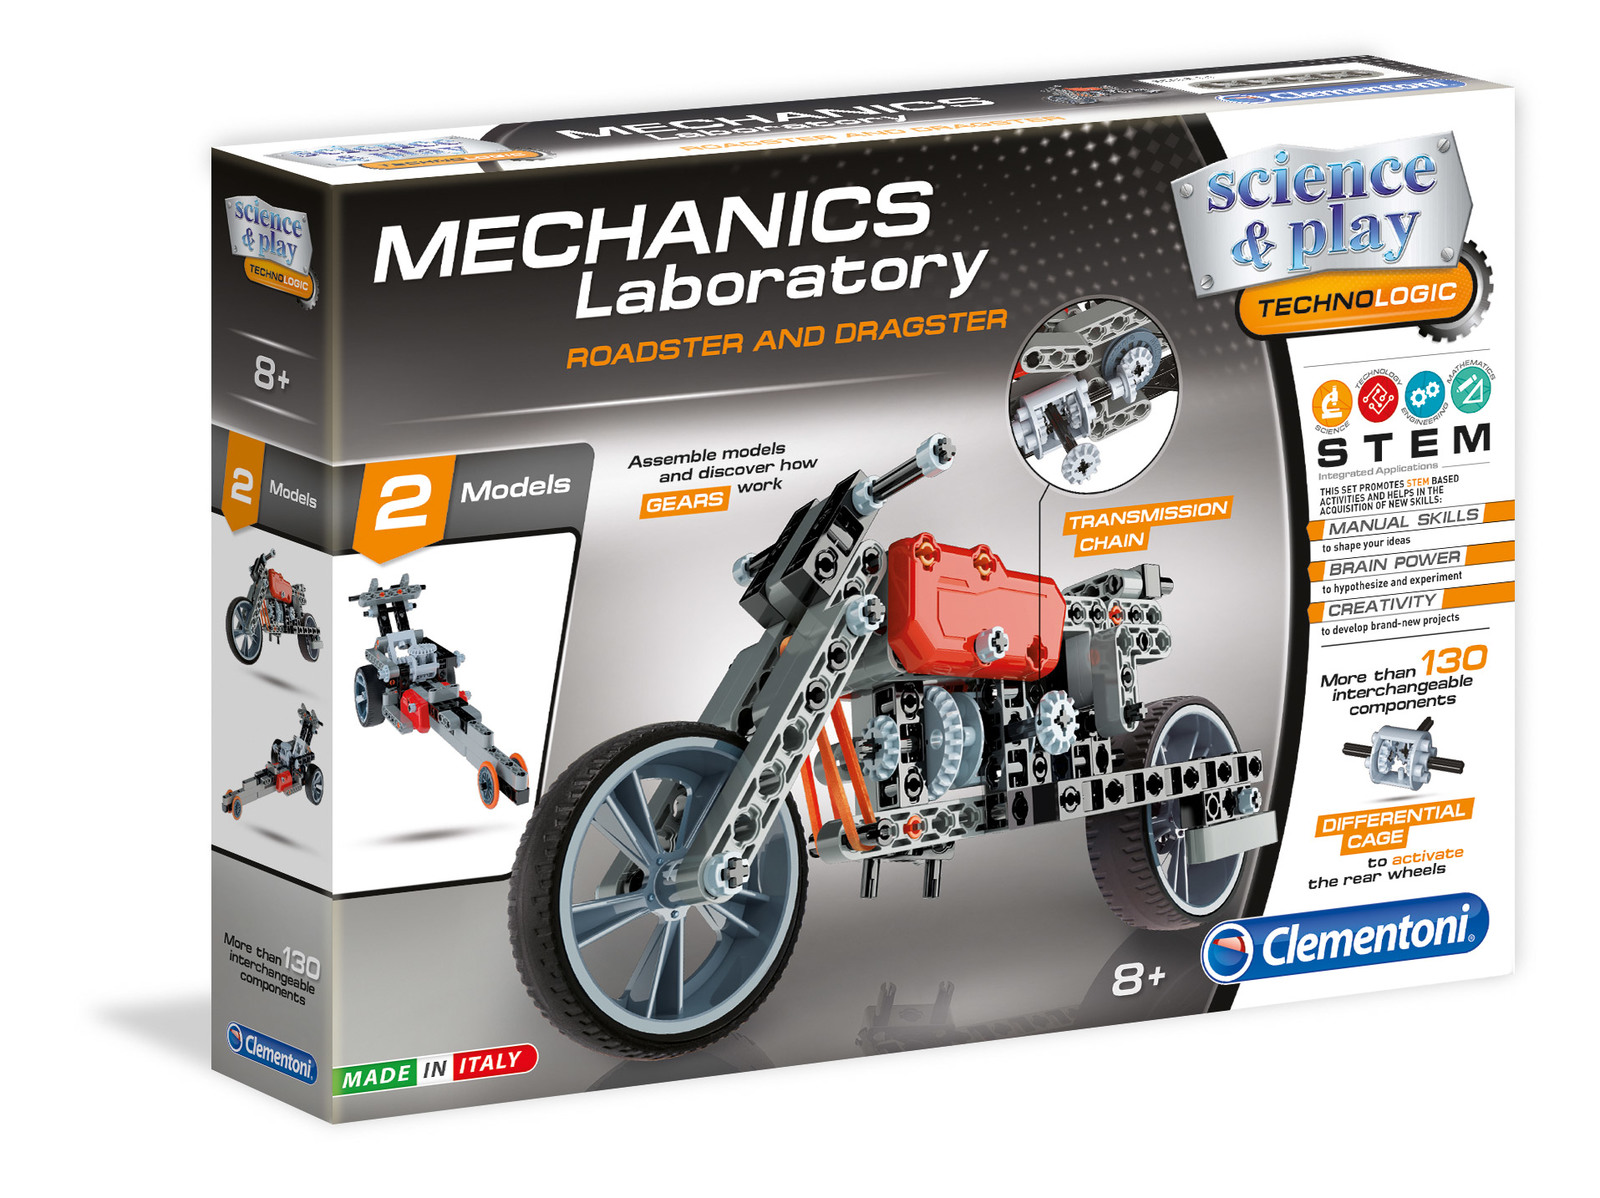 Clementoni Mechanical Laboratory-როადსტერი და დრაგსტერი